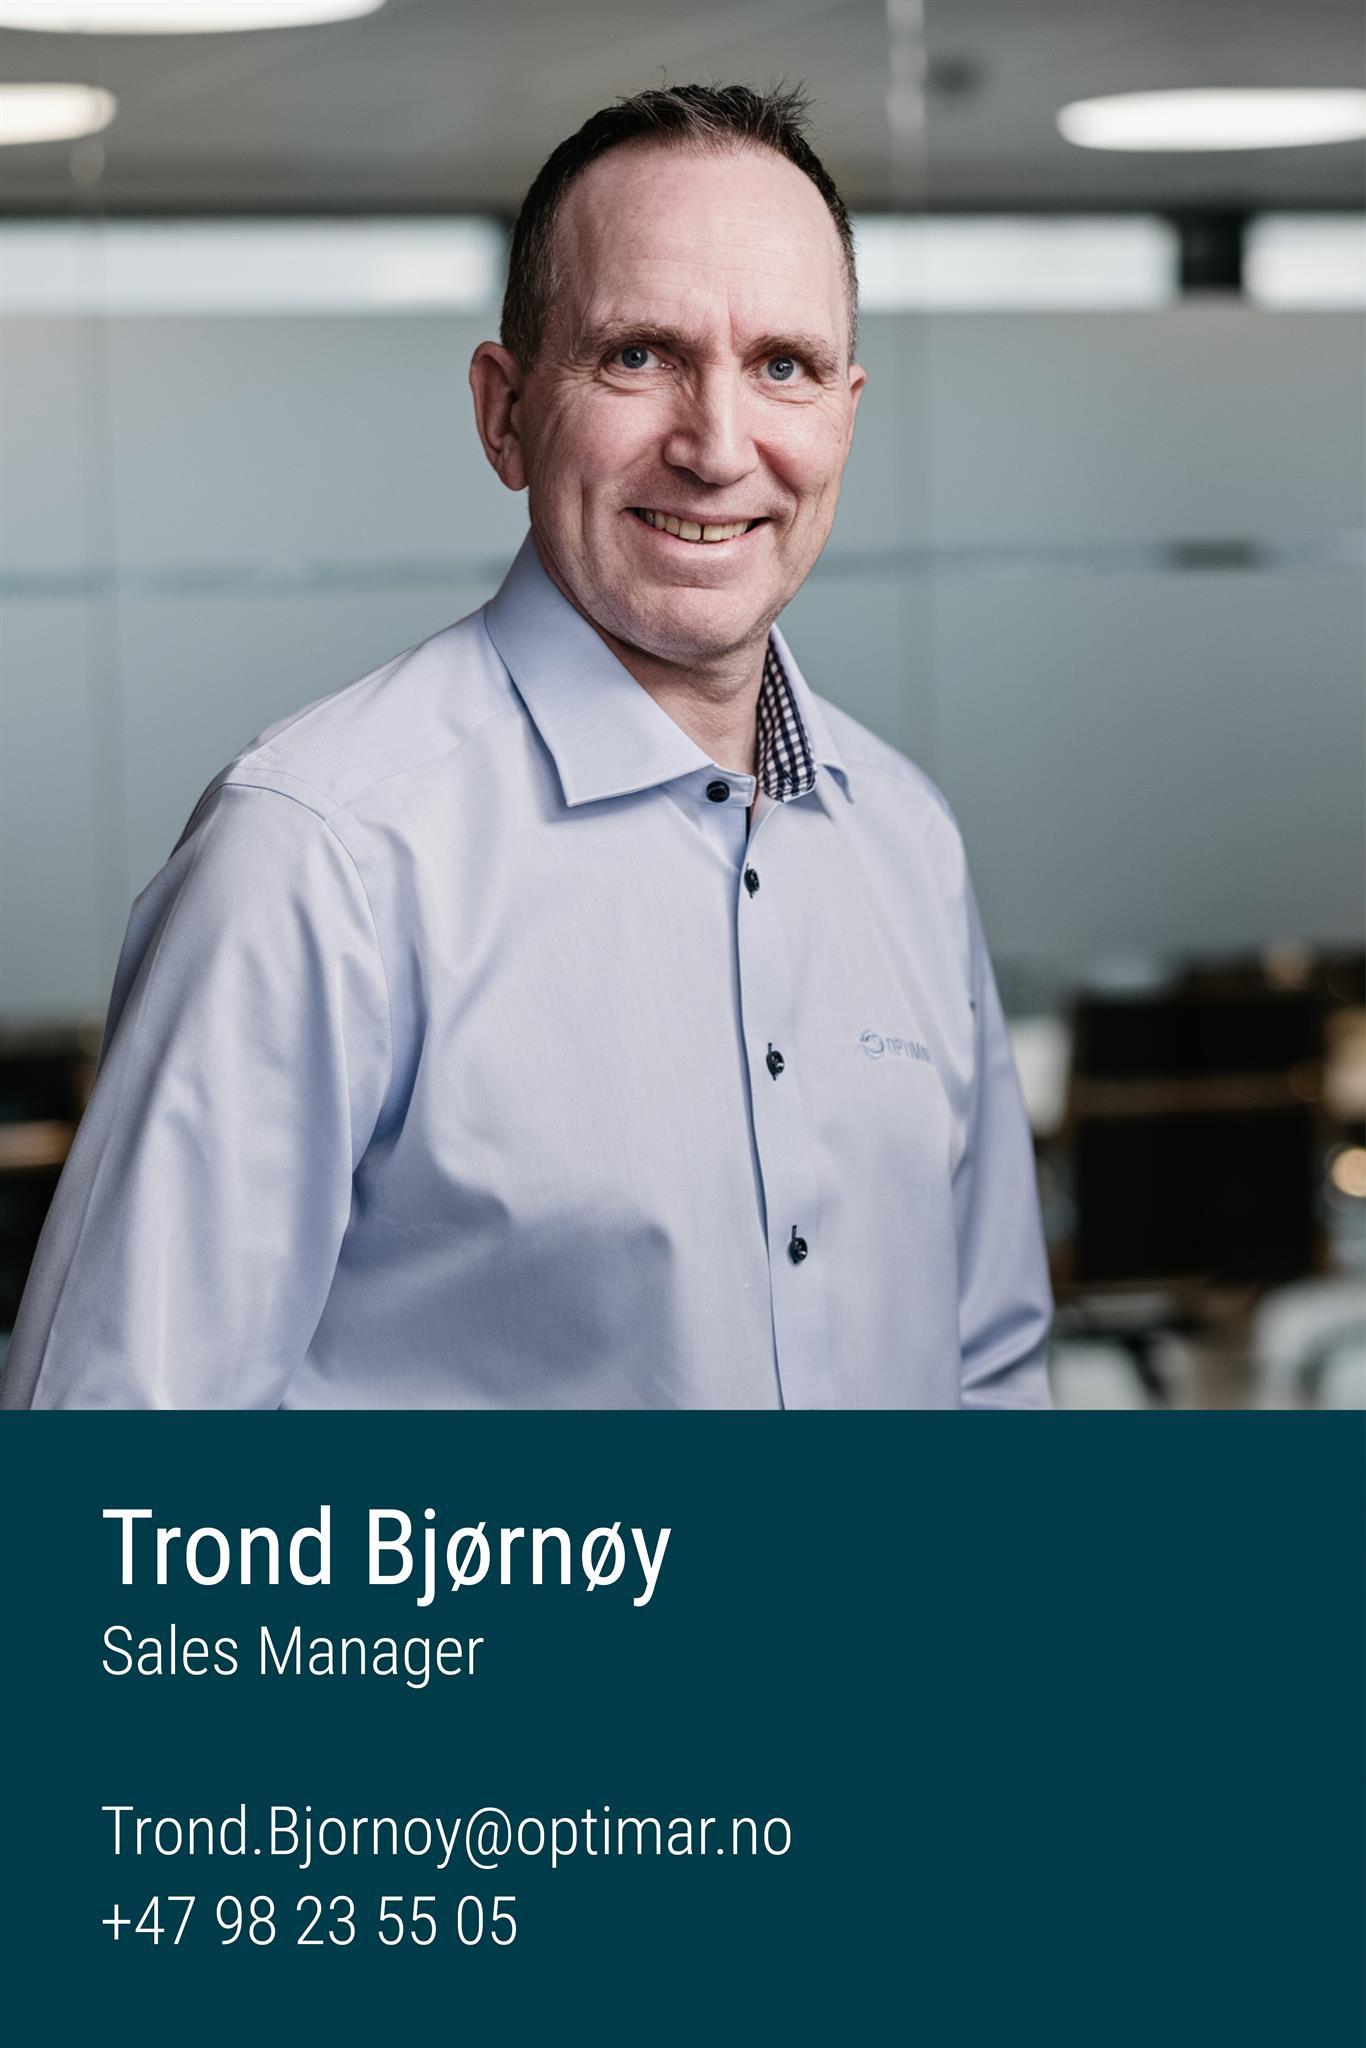 Trond Bjørnøy